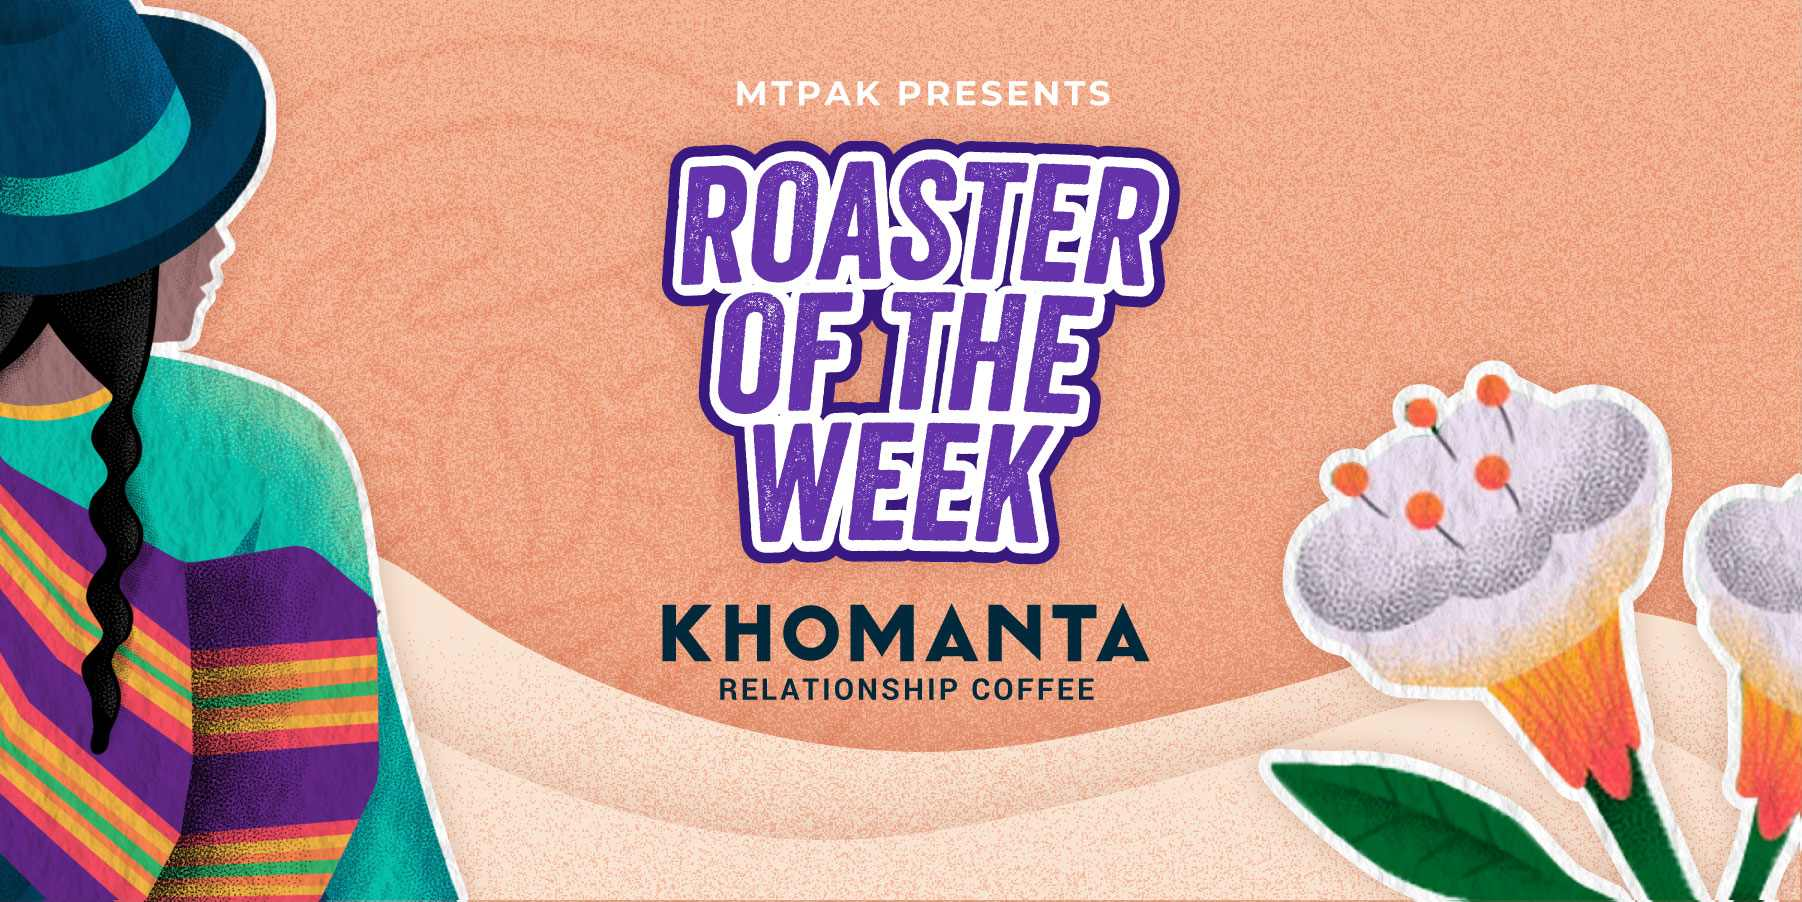 Khomanta: The Kansas City roasters on a quest to make genuine change at origin